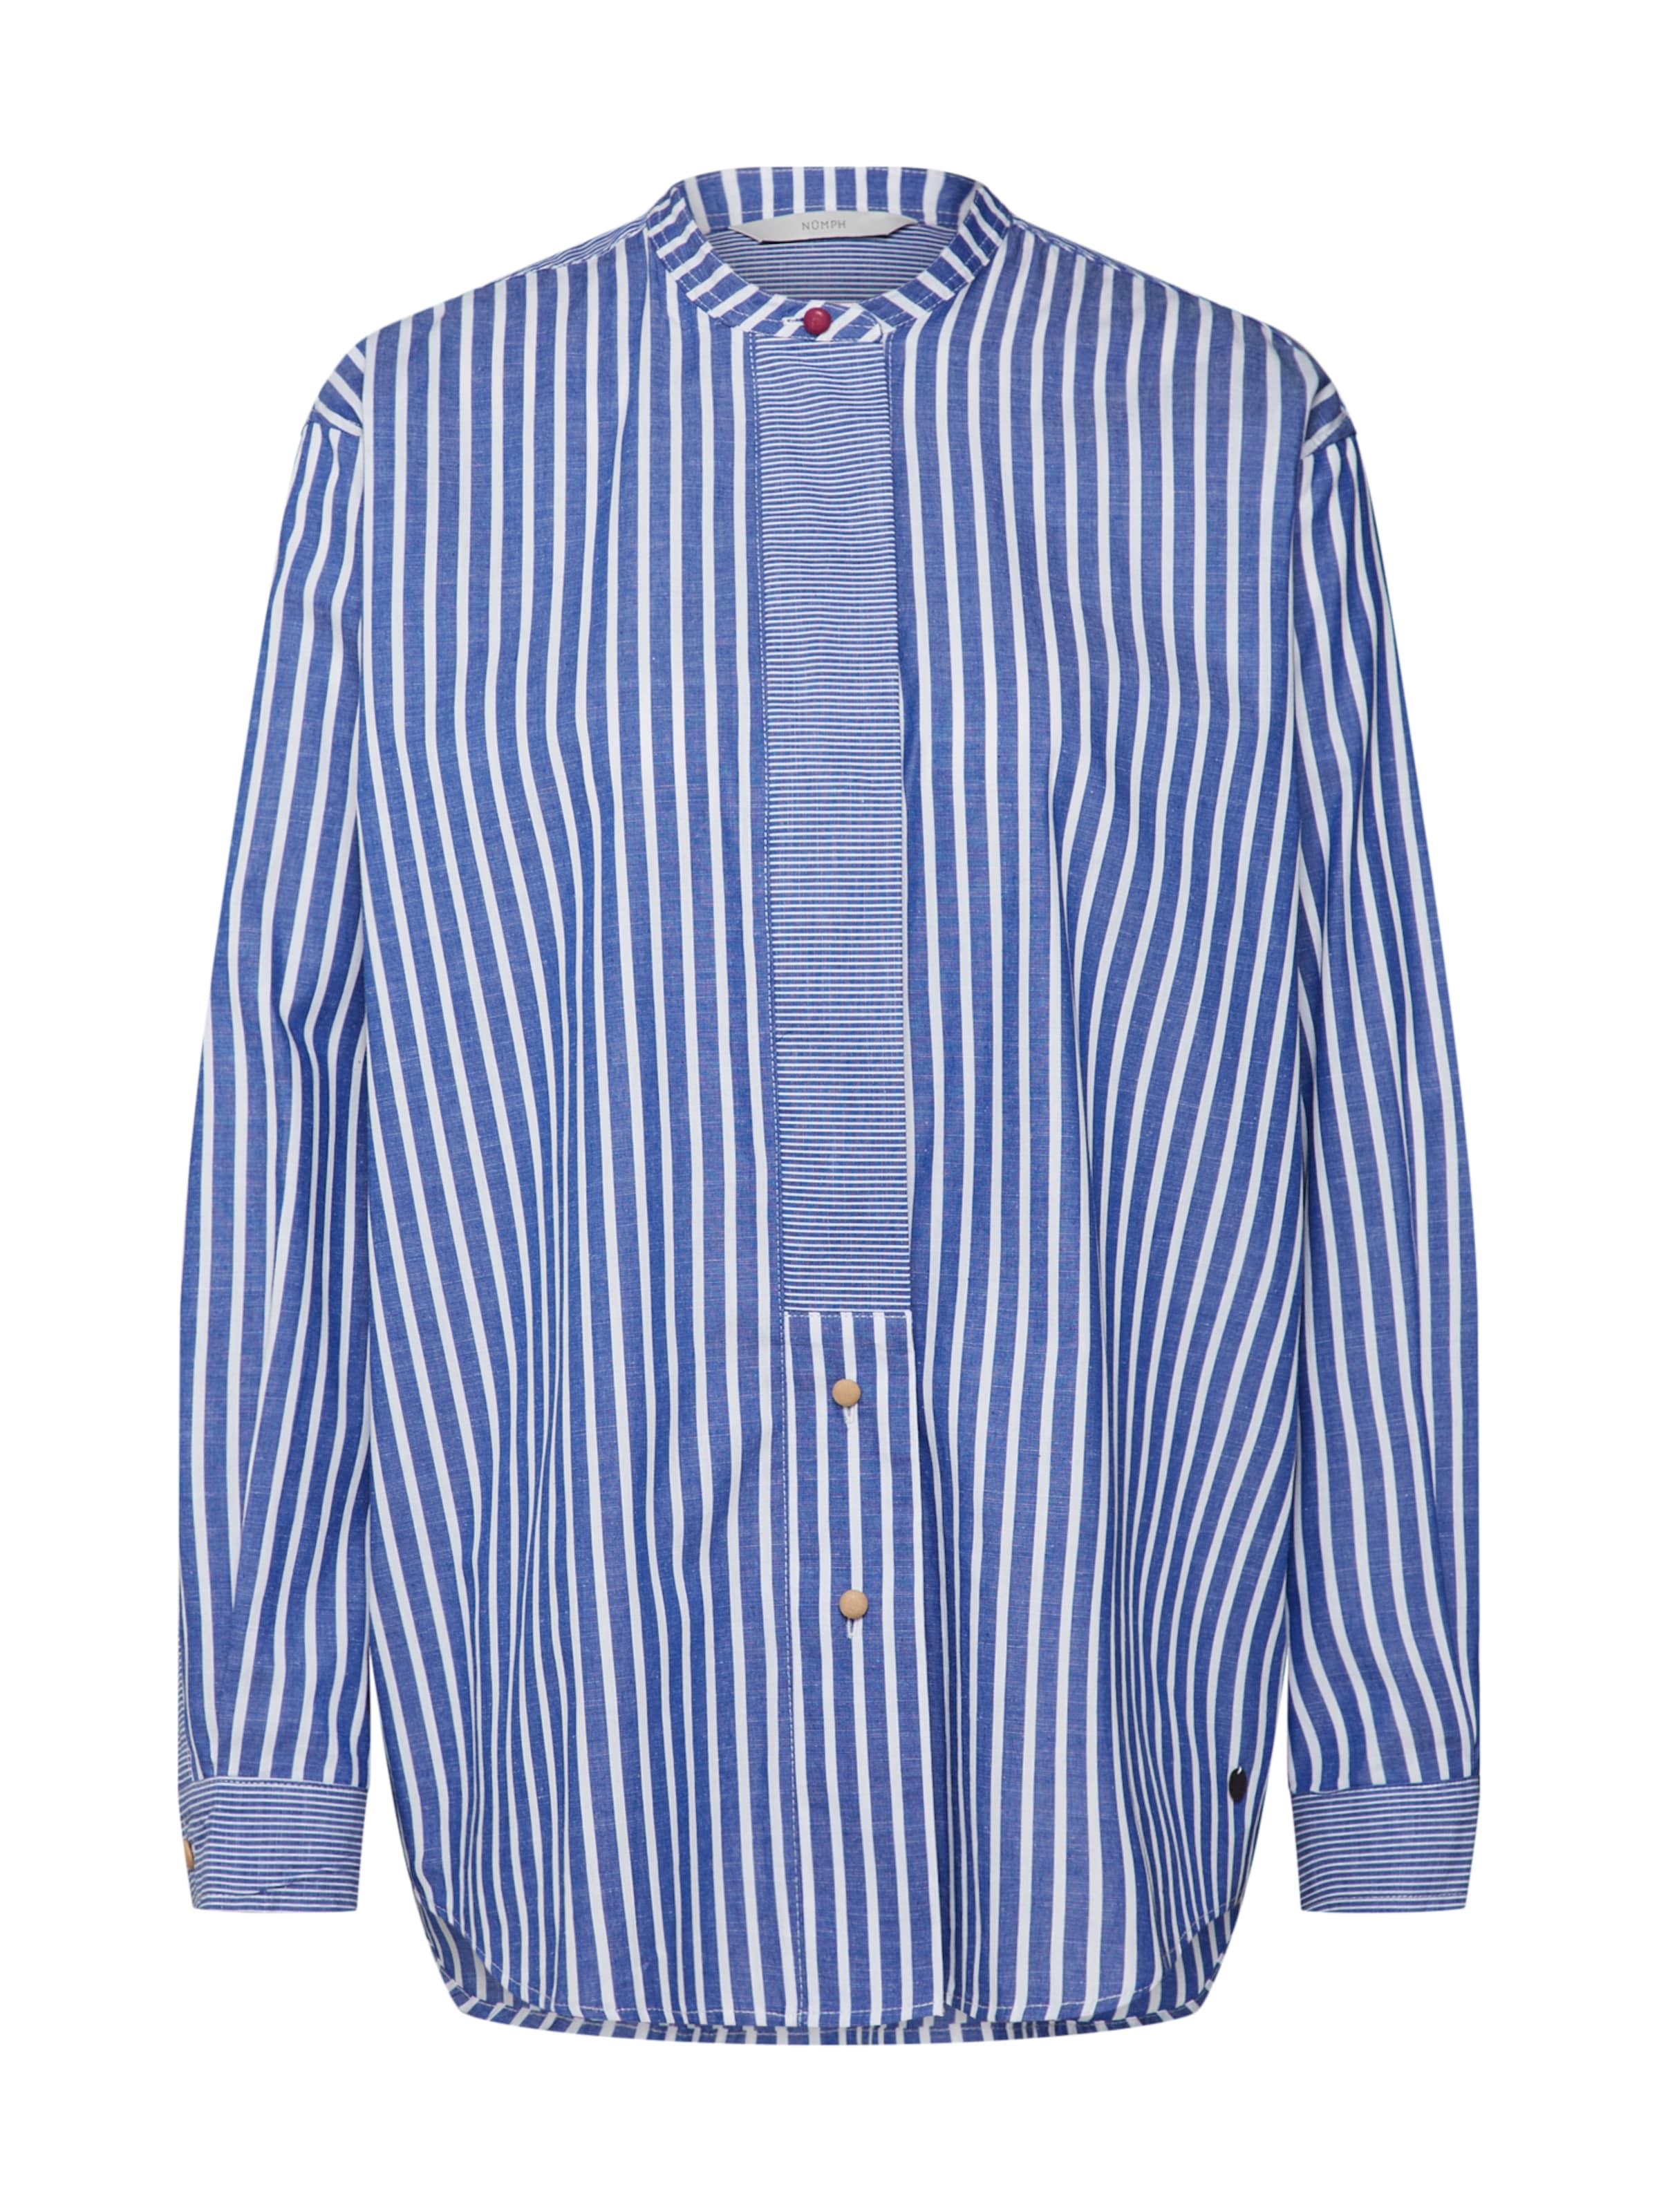 Nümph 'indie Chemisier En BleuBlanc Shirt' 7Ybvf6gy